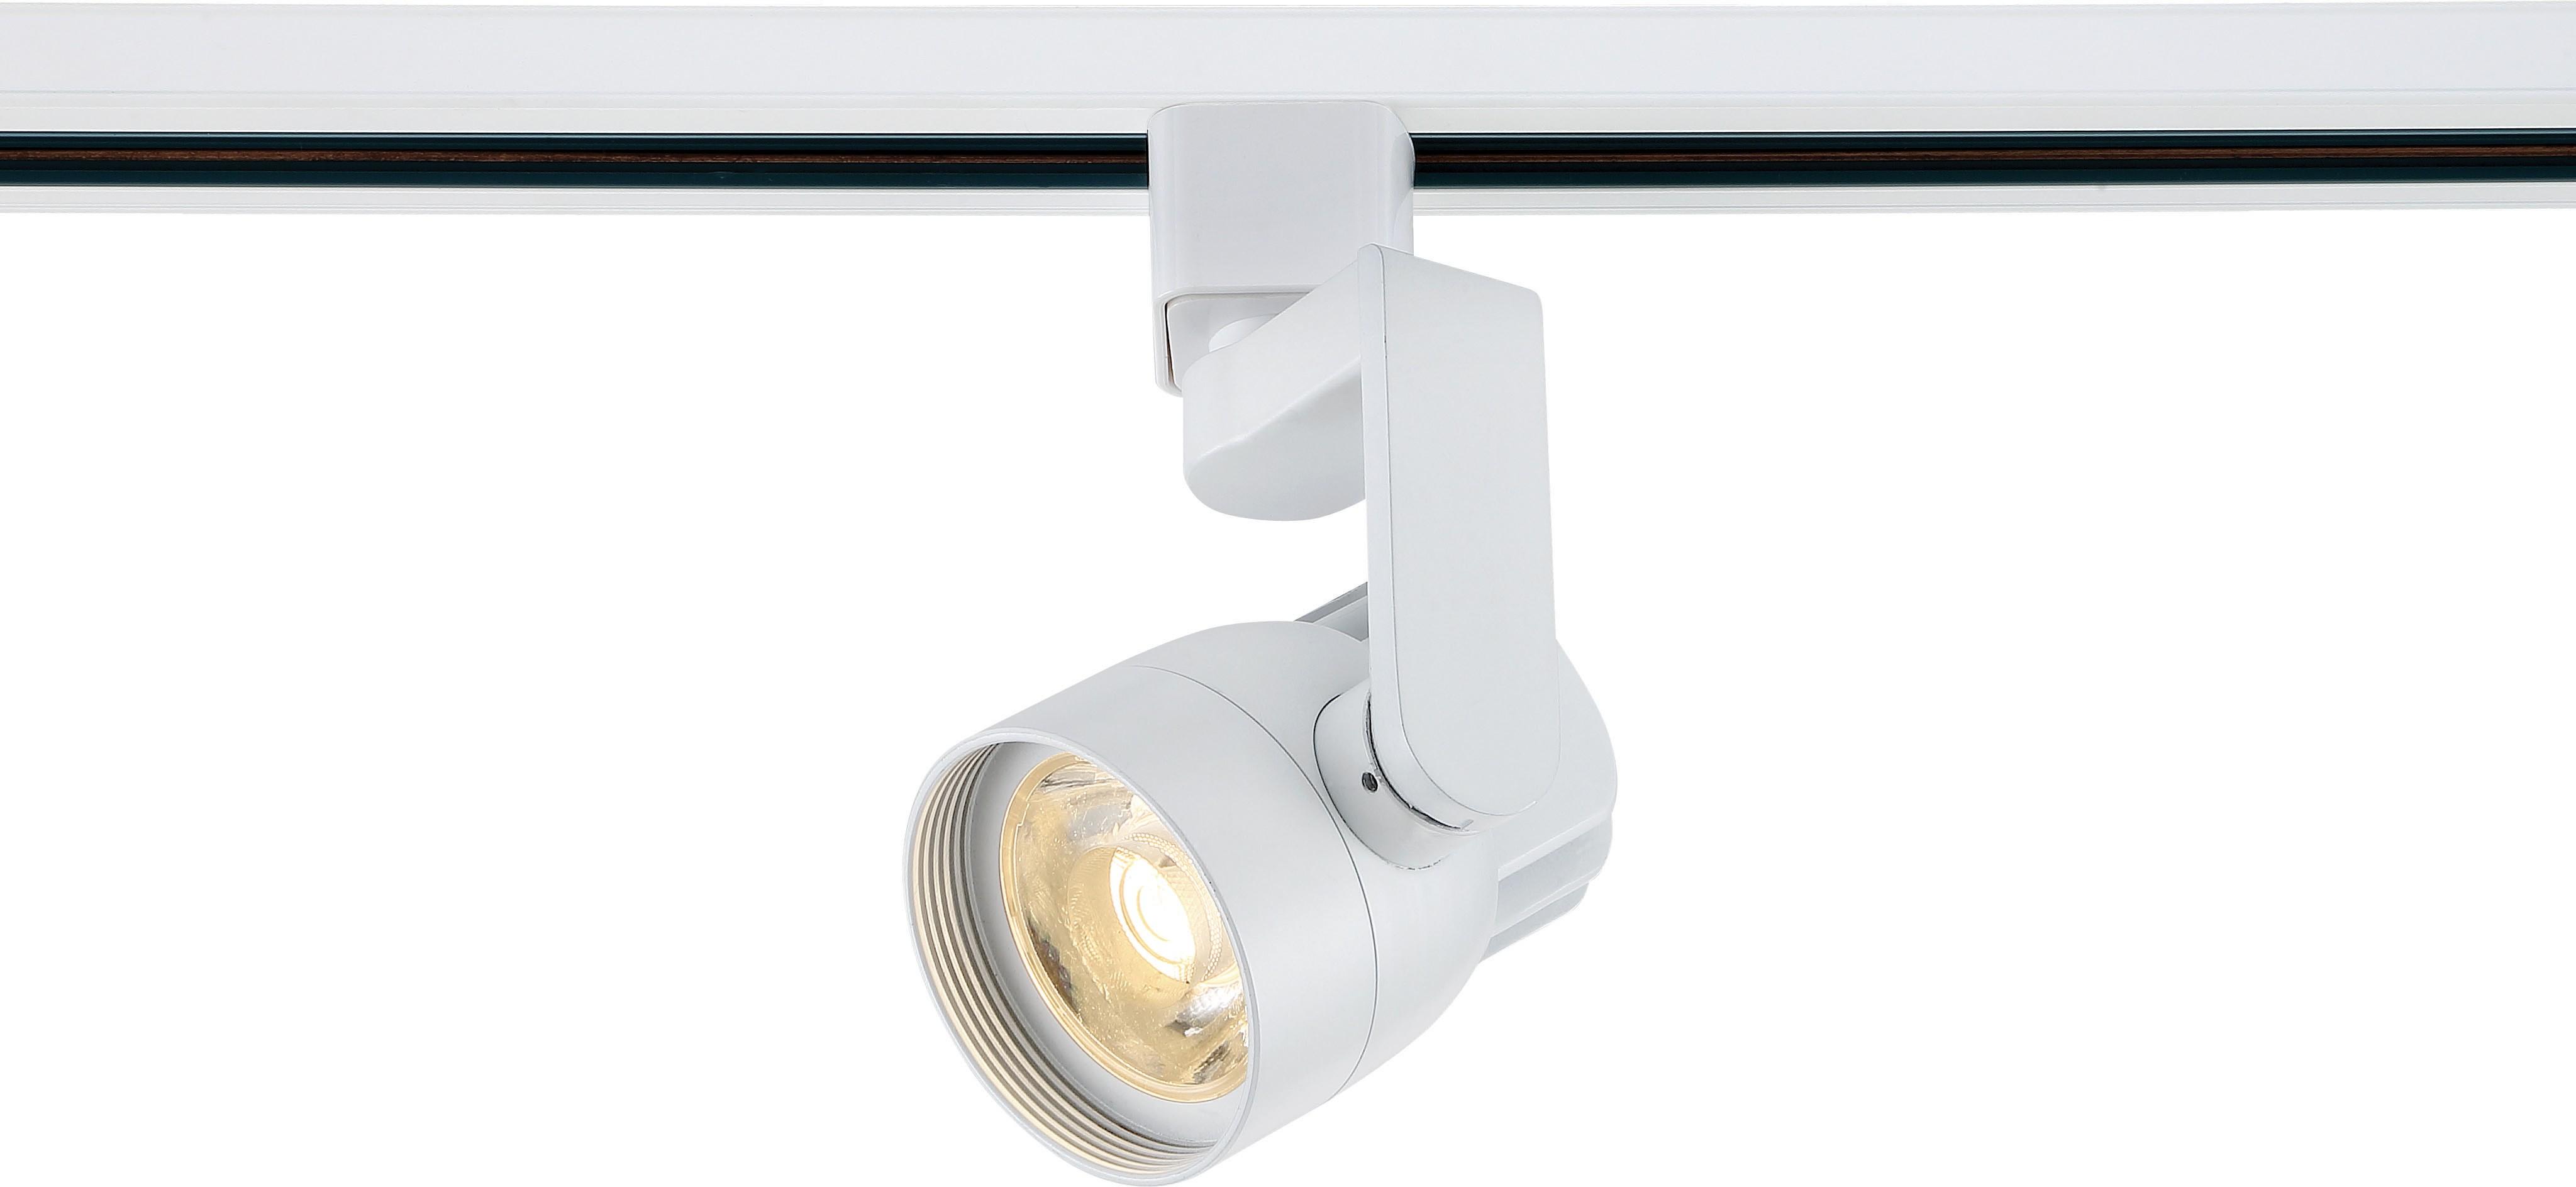 Nuvo Lighting Th421 1 Light Led 12w Track Head Angle Arm